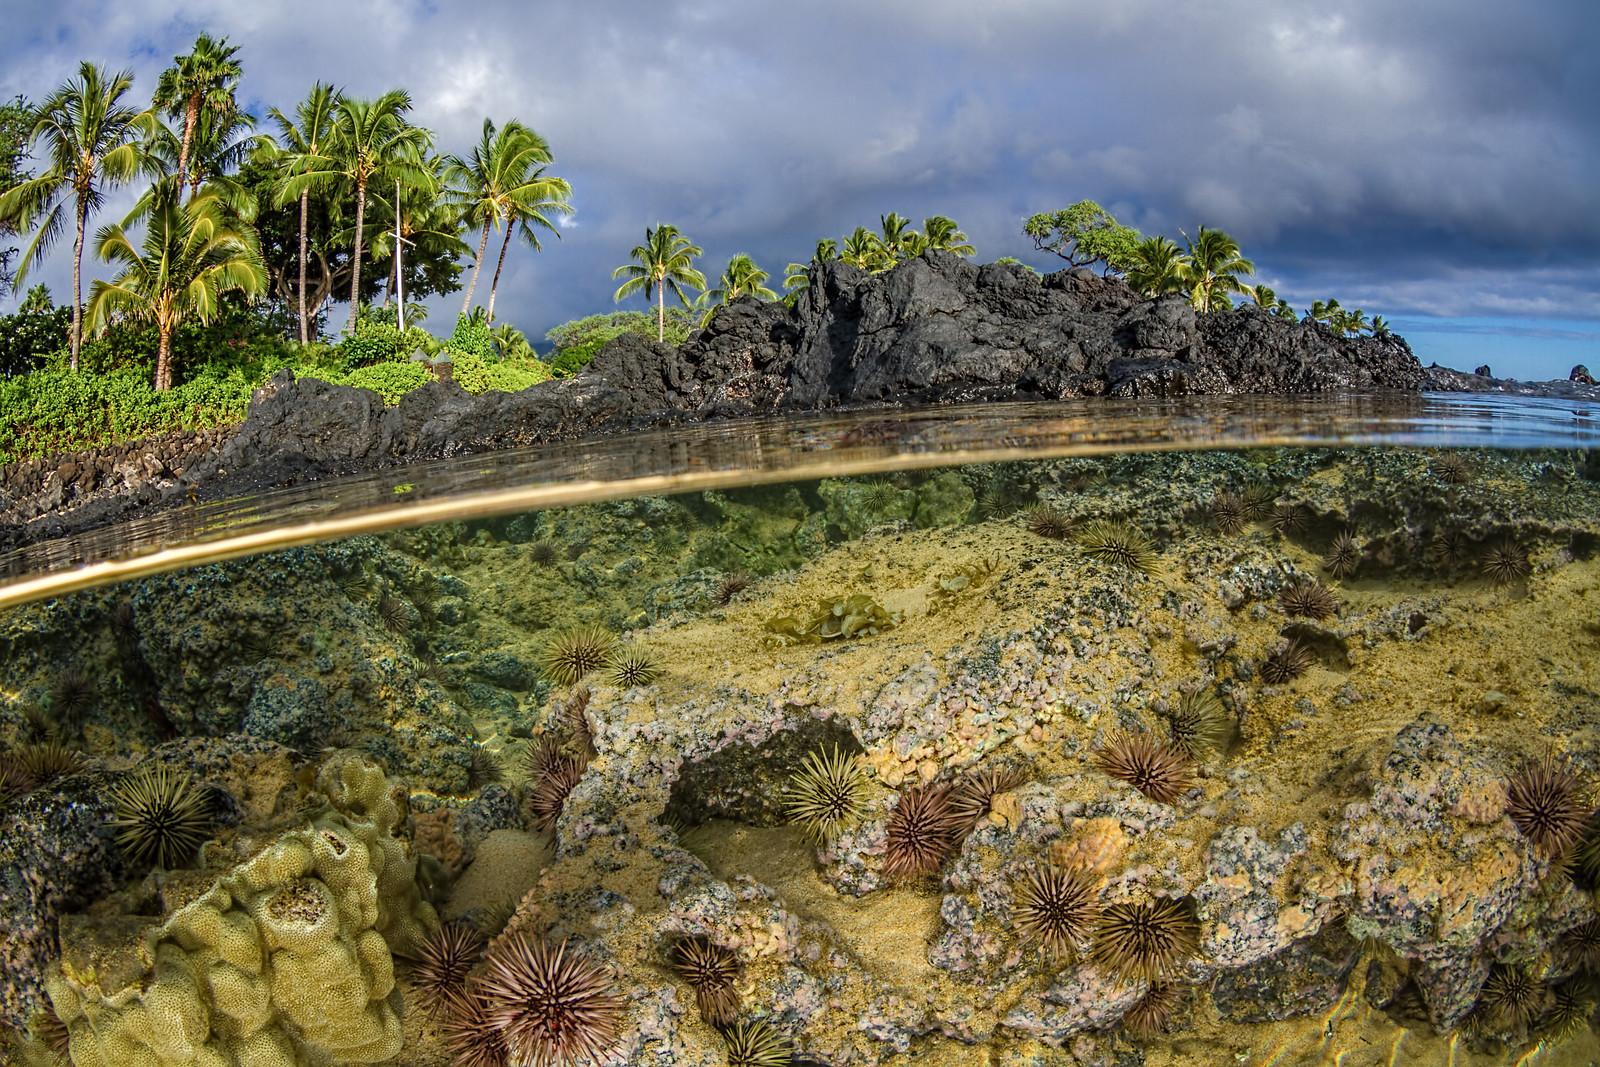 Secret Beach image courtesy Krannichfeld Photography.